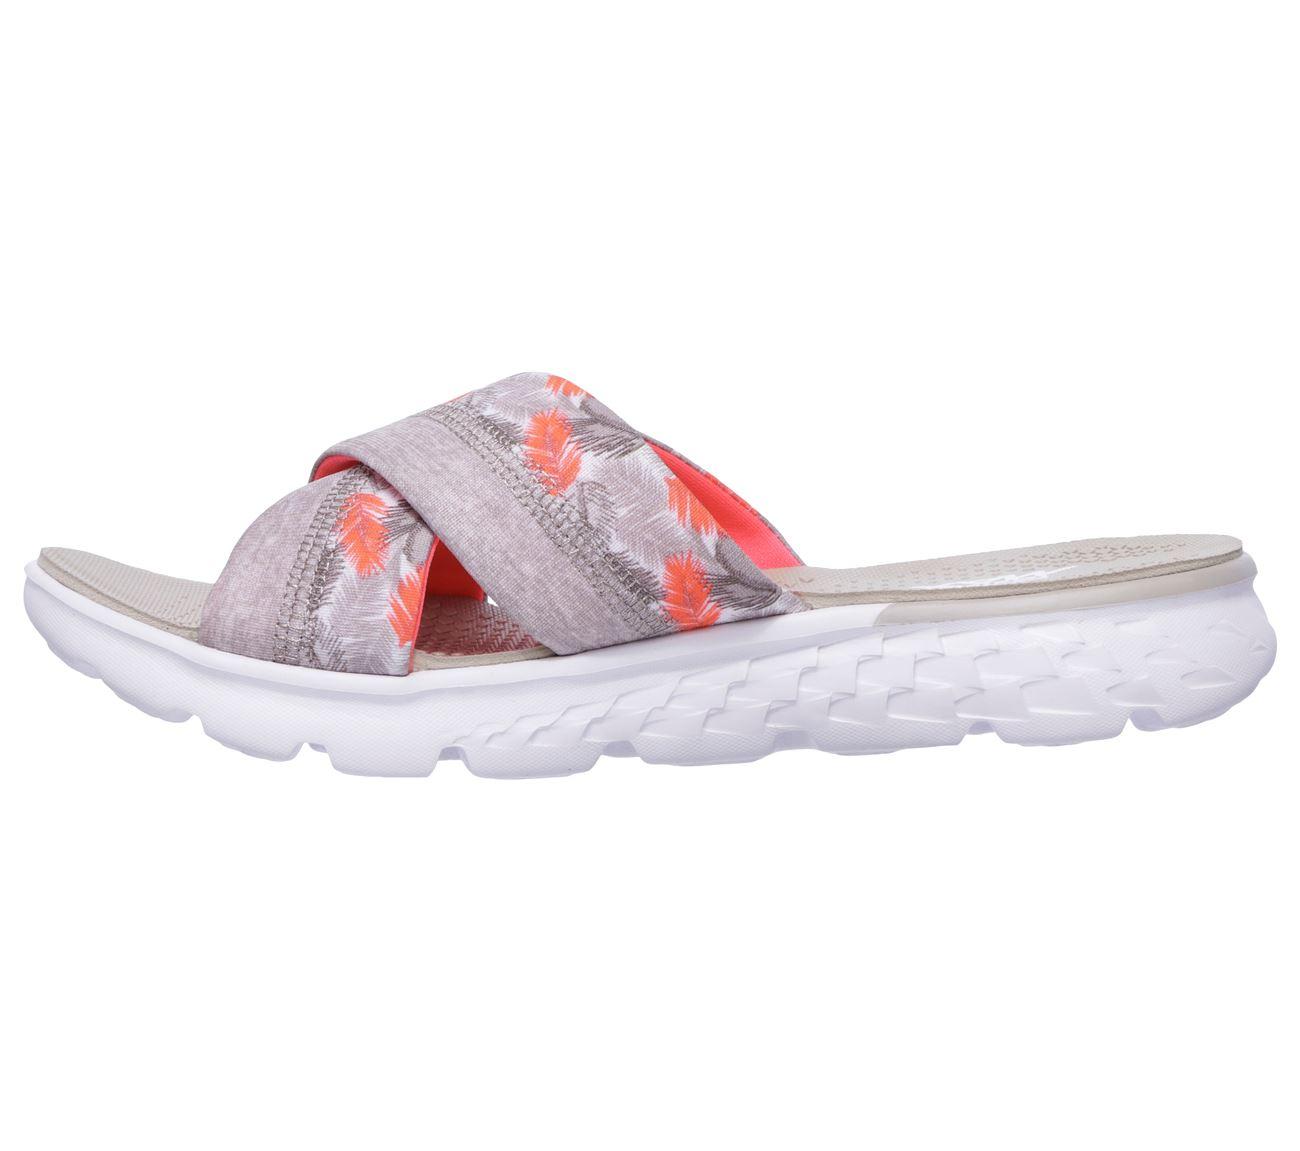 d723081ad578 Skechers Performance Women s On The GO 400 Tropical Sandal